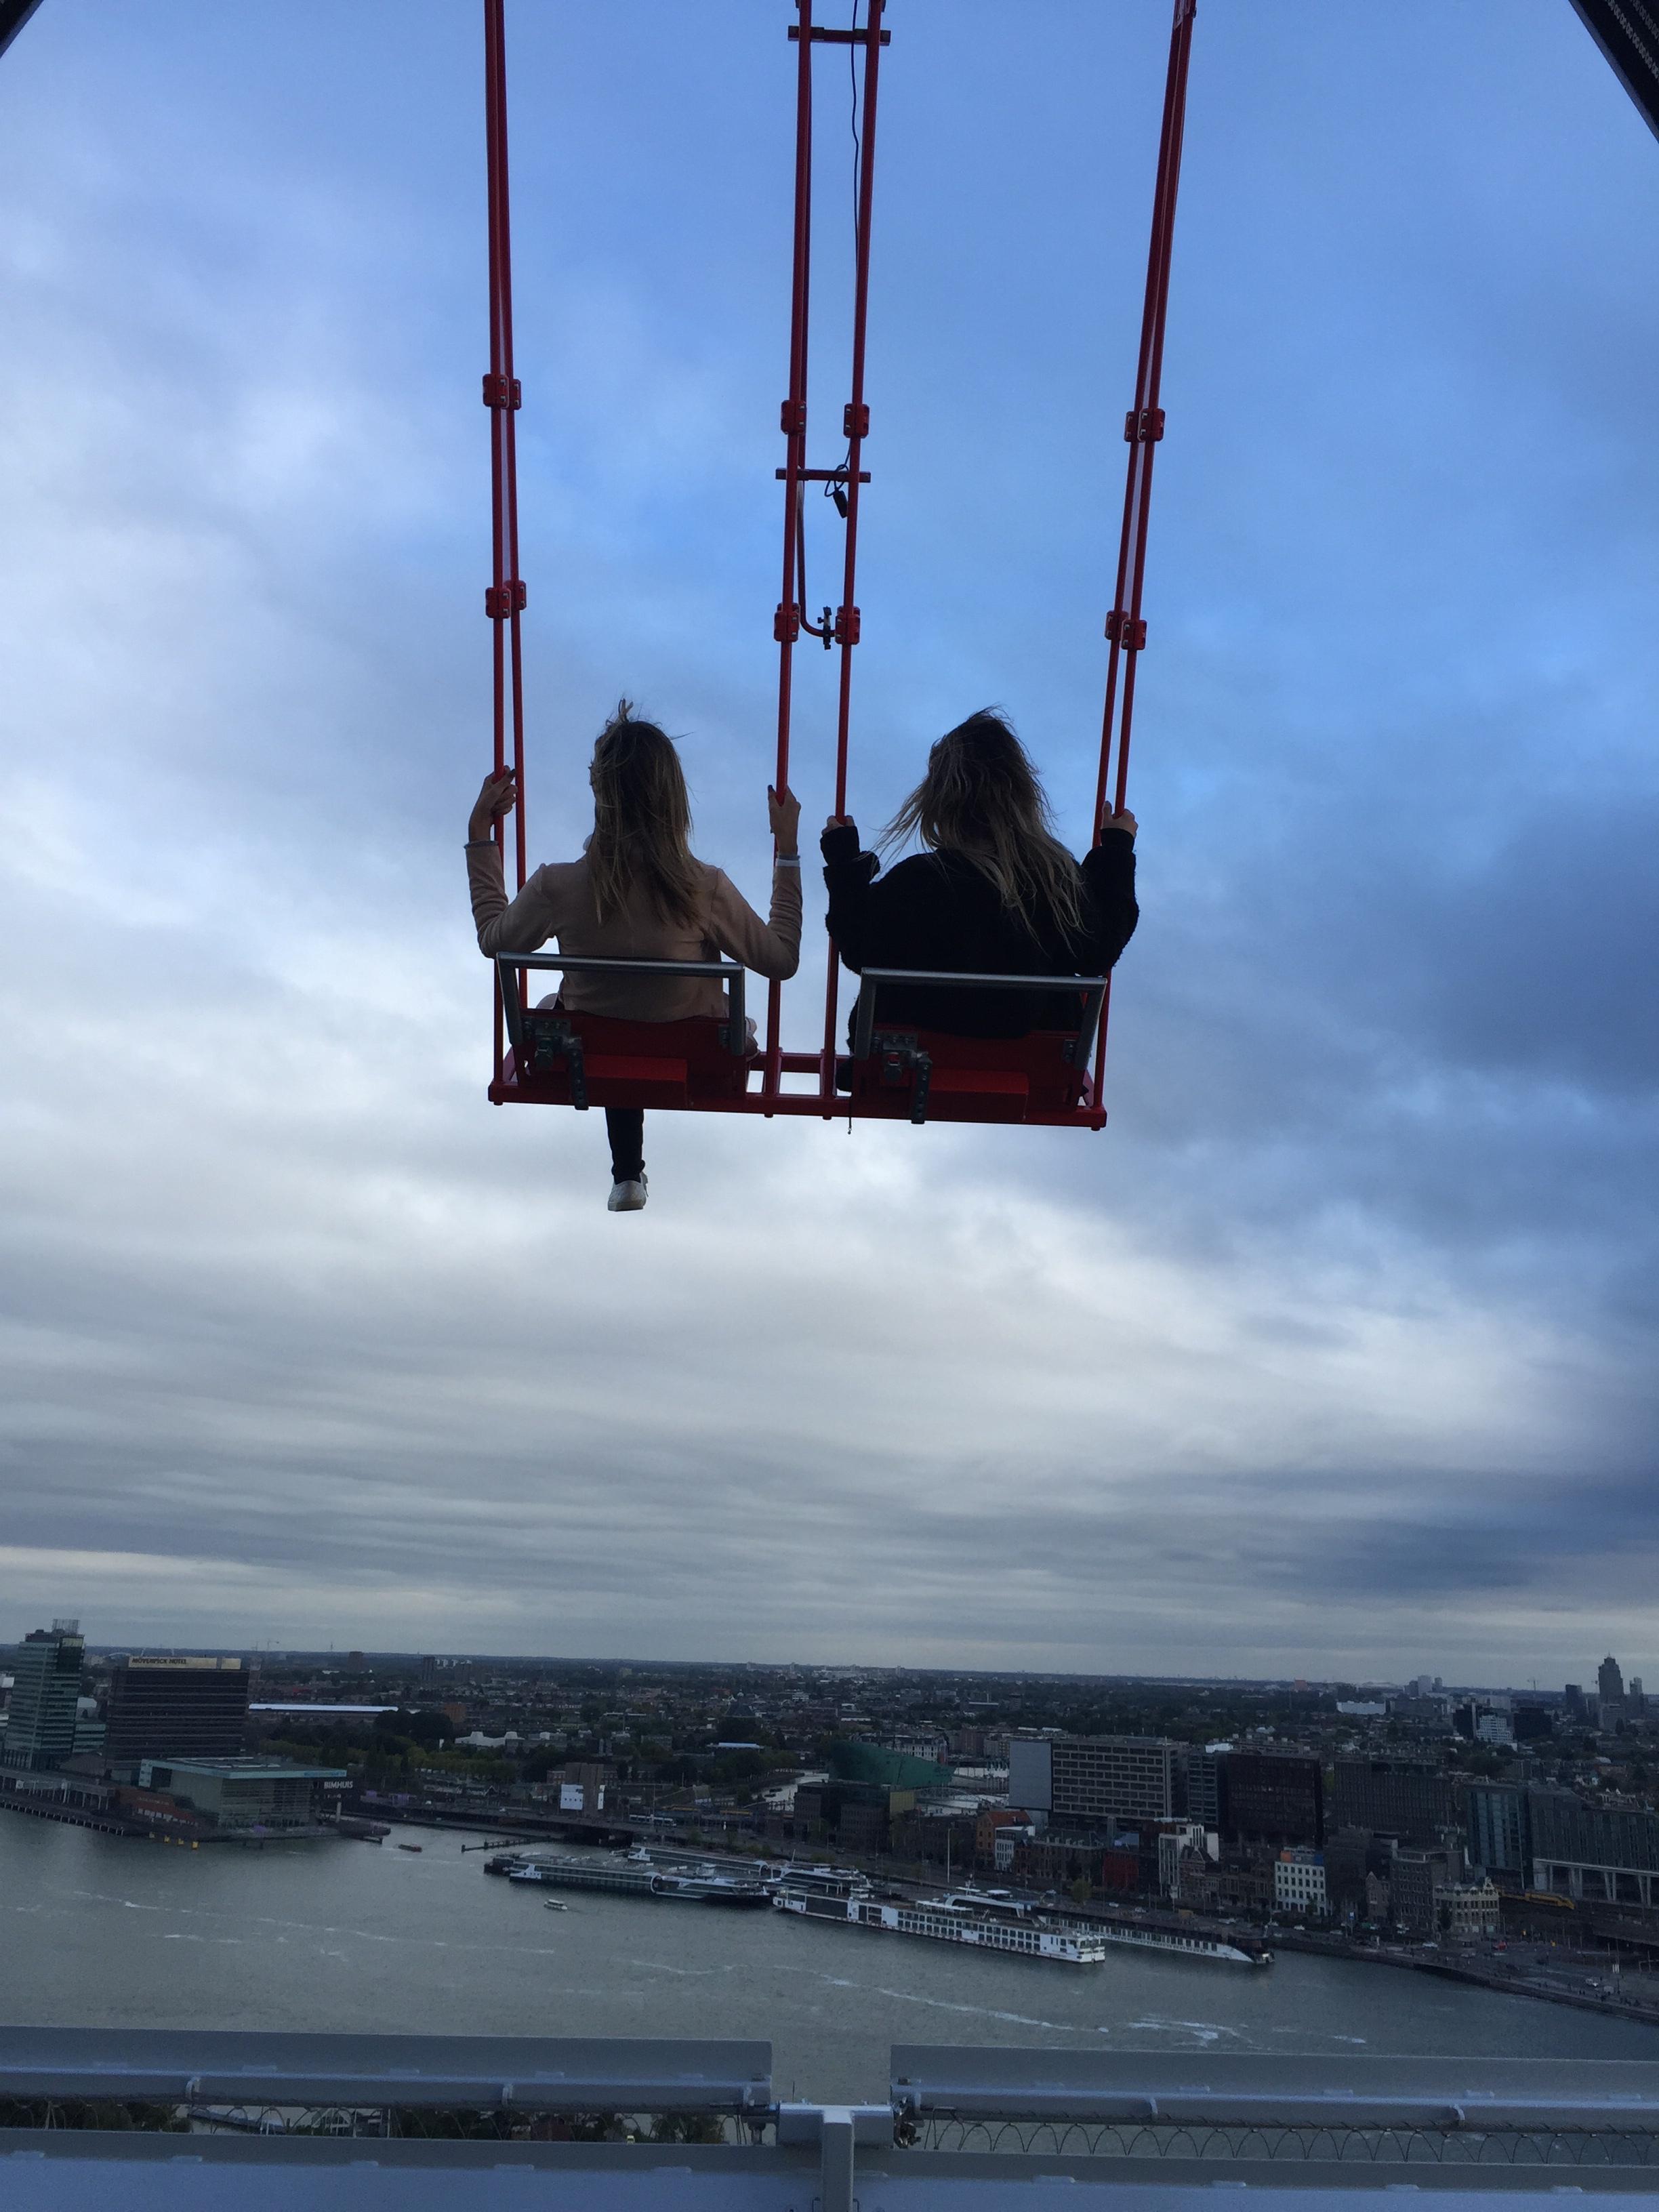 lookout-balanca-mais-alta-europa-amsterdam-1